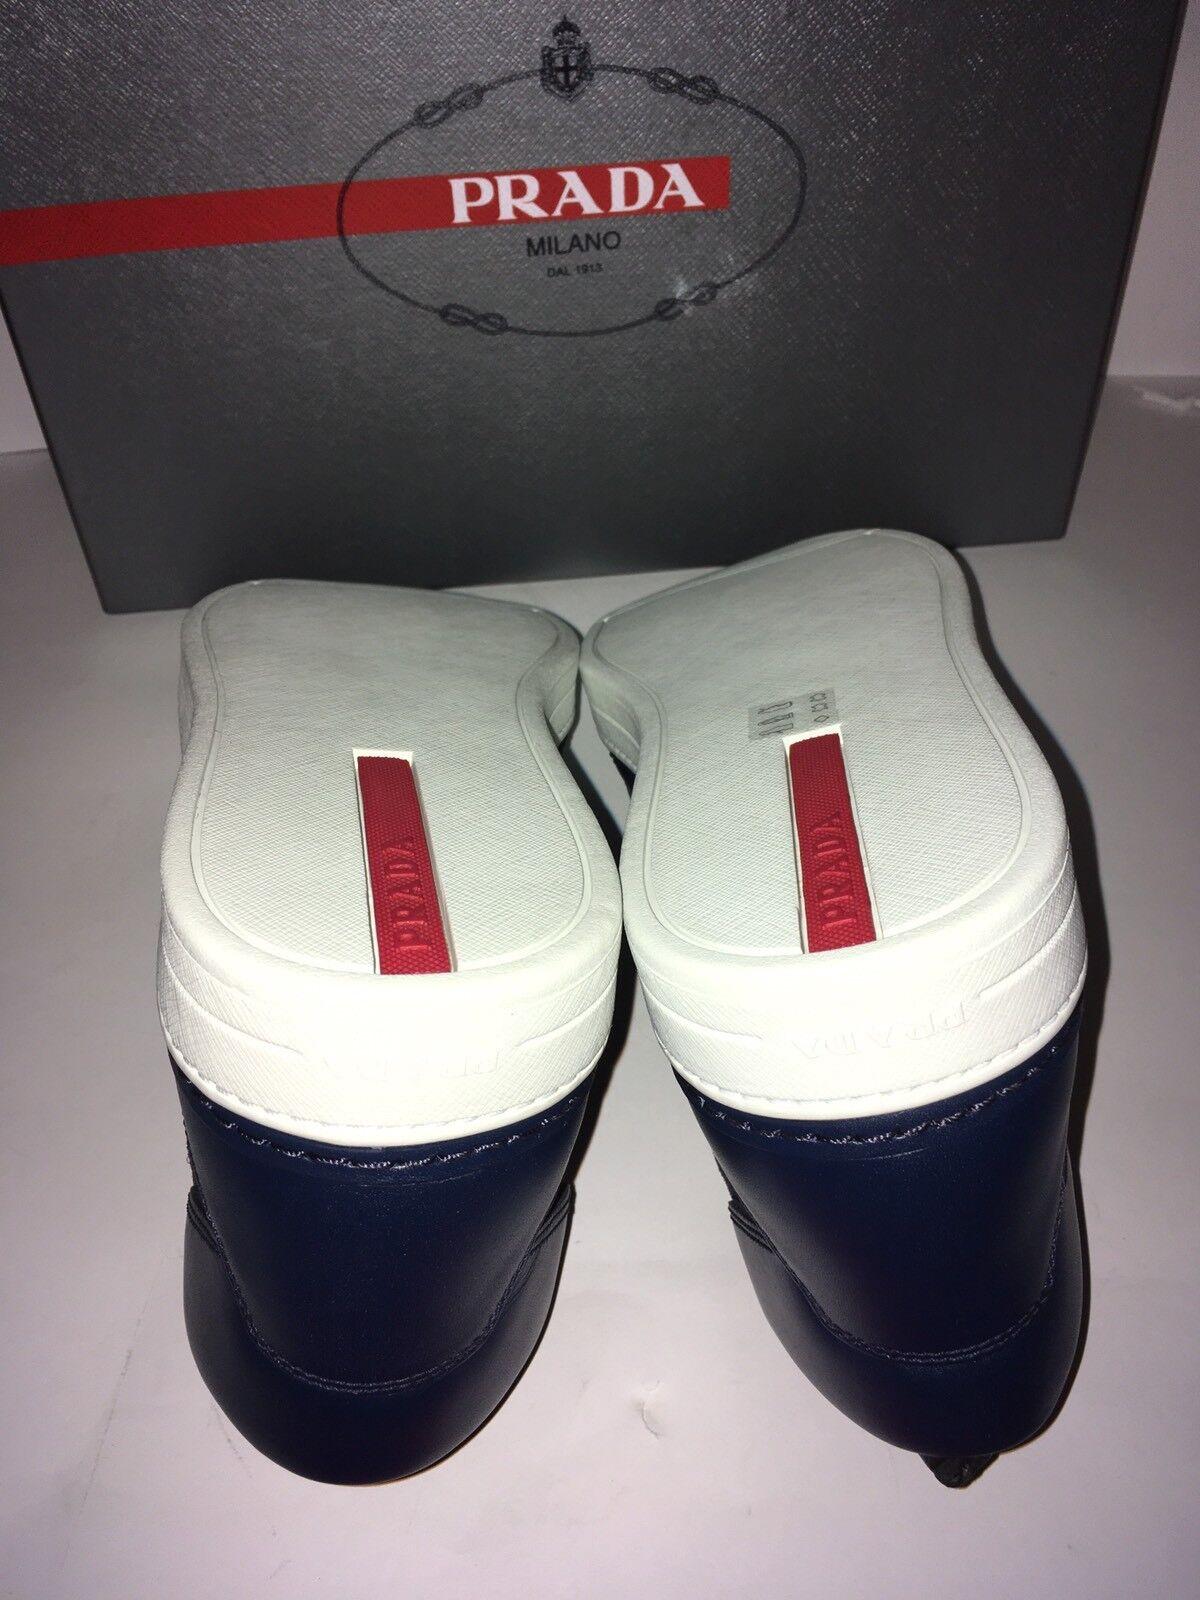 Prada Sneaker Gr 41 41 Gr Neu abd3c8